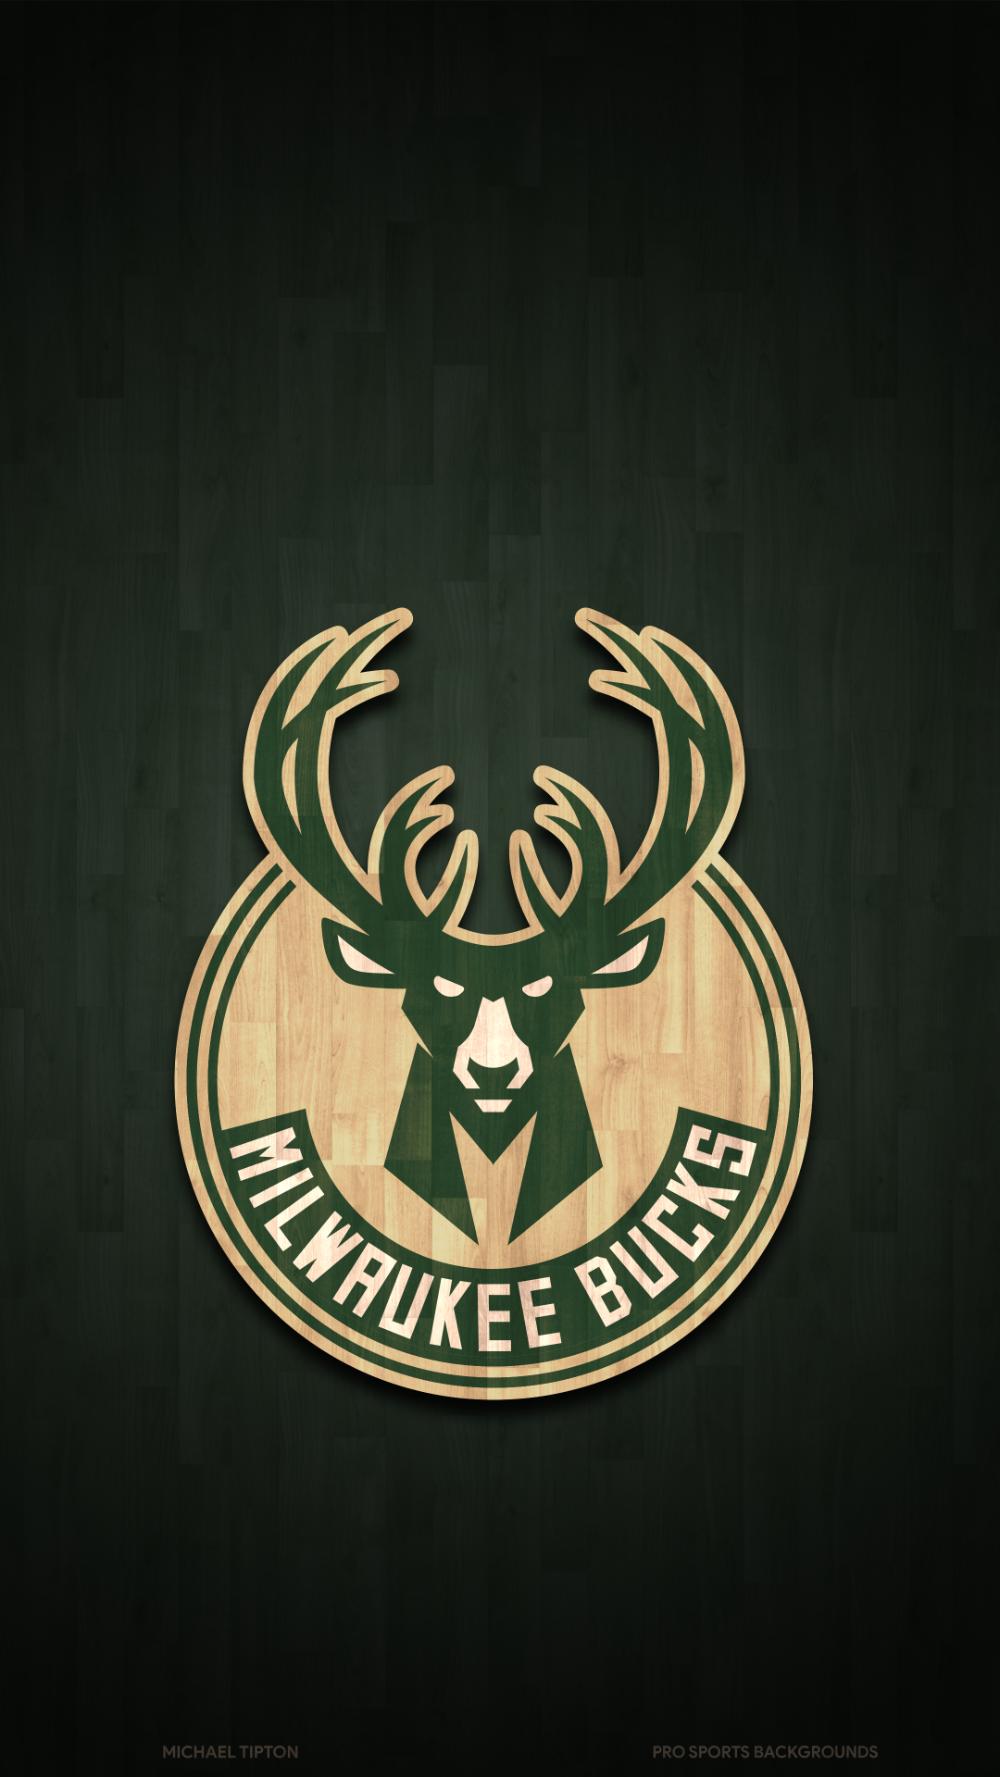 Milwaukee Bucks Wallpapers Nba wallpapers, Nba